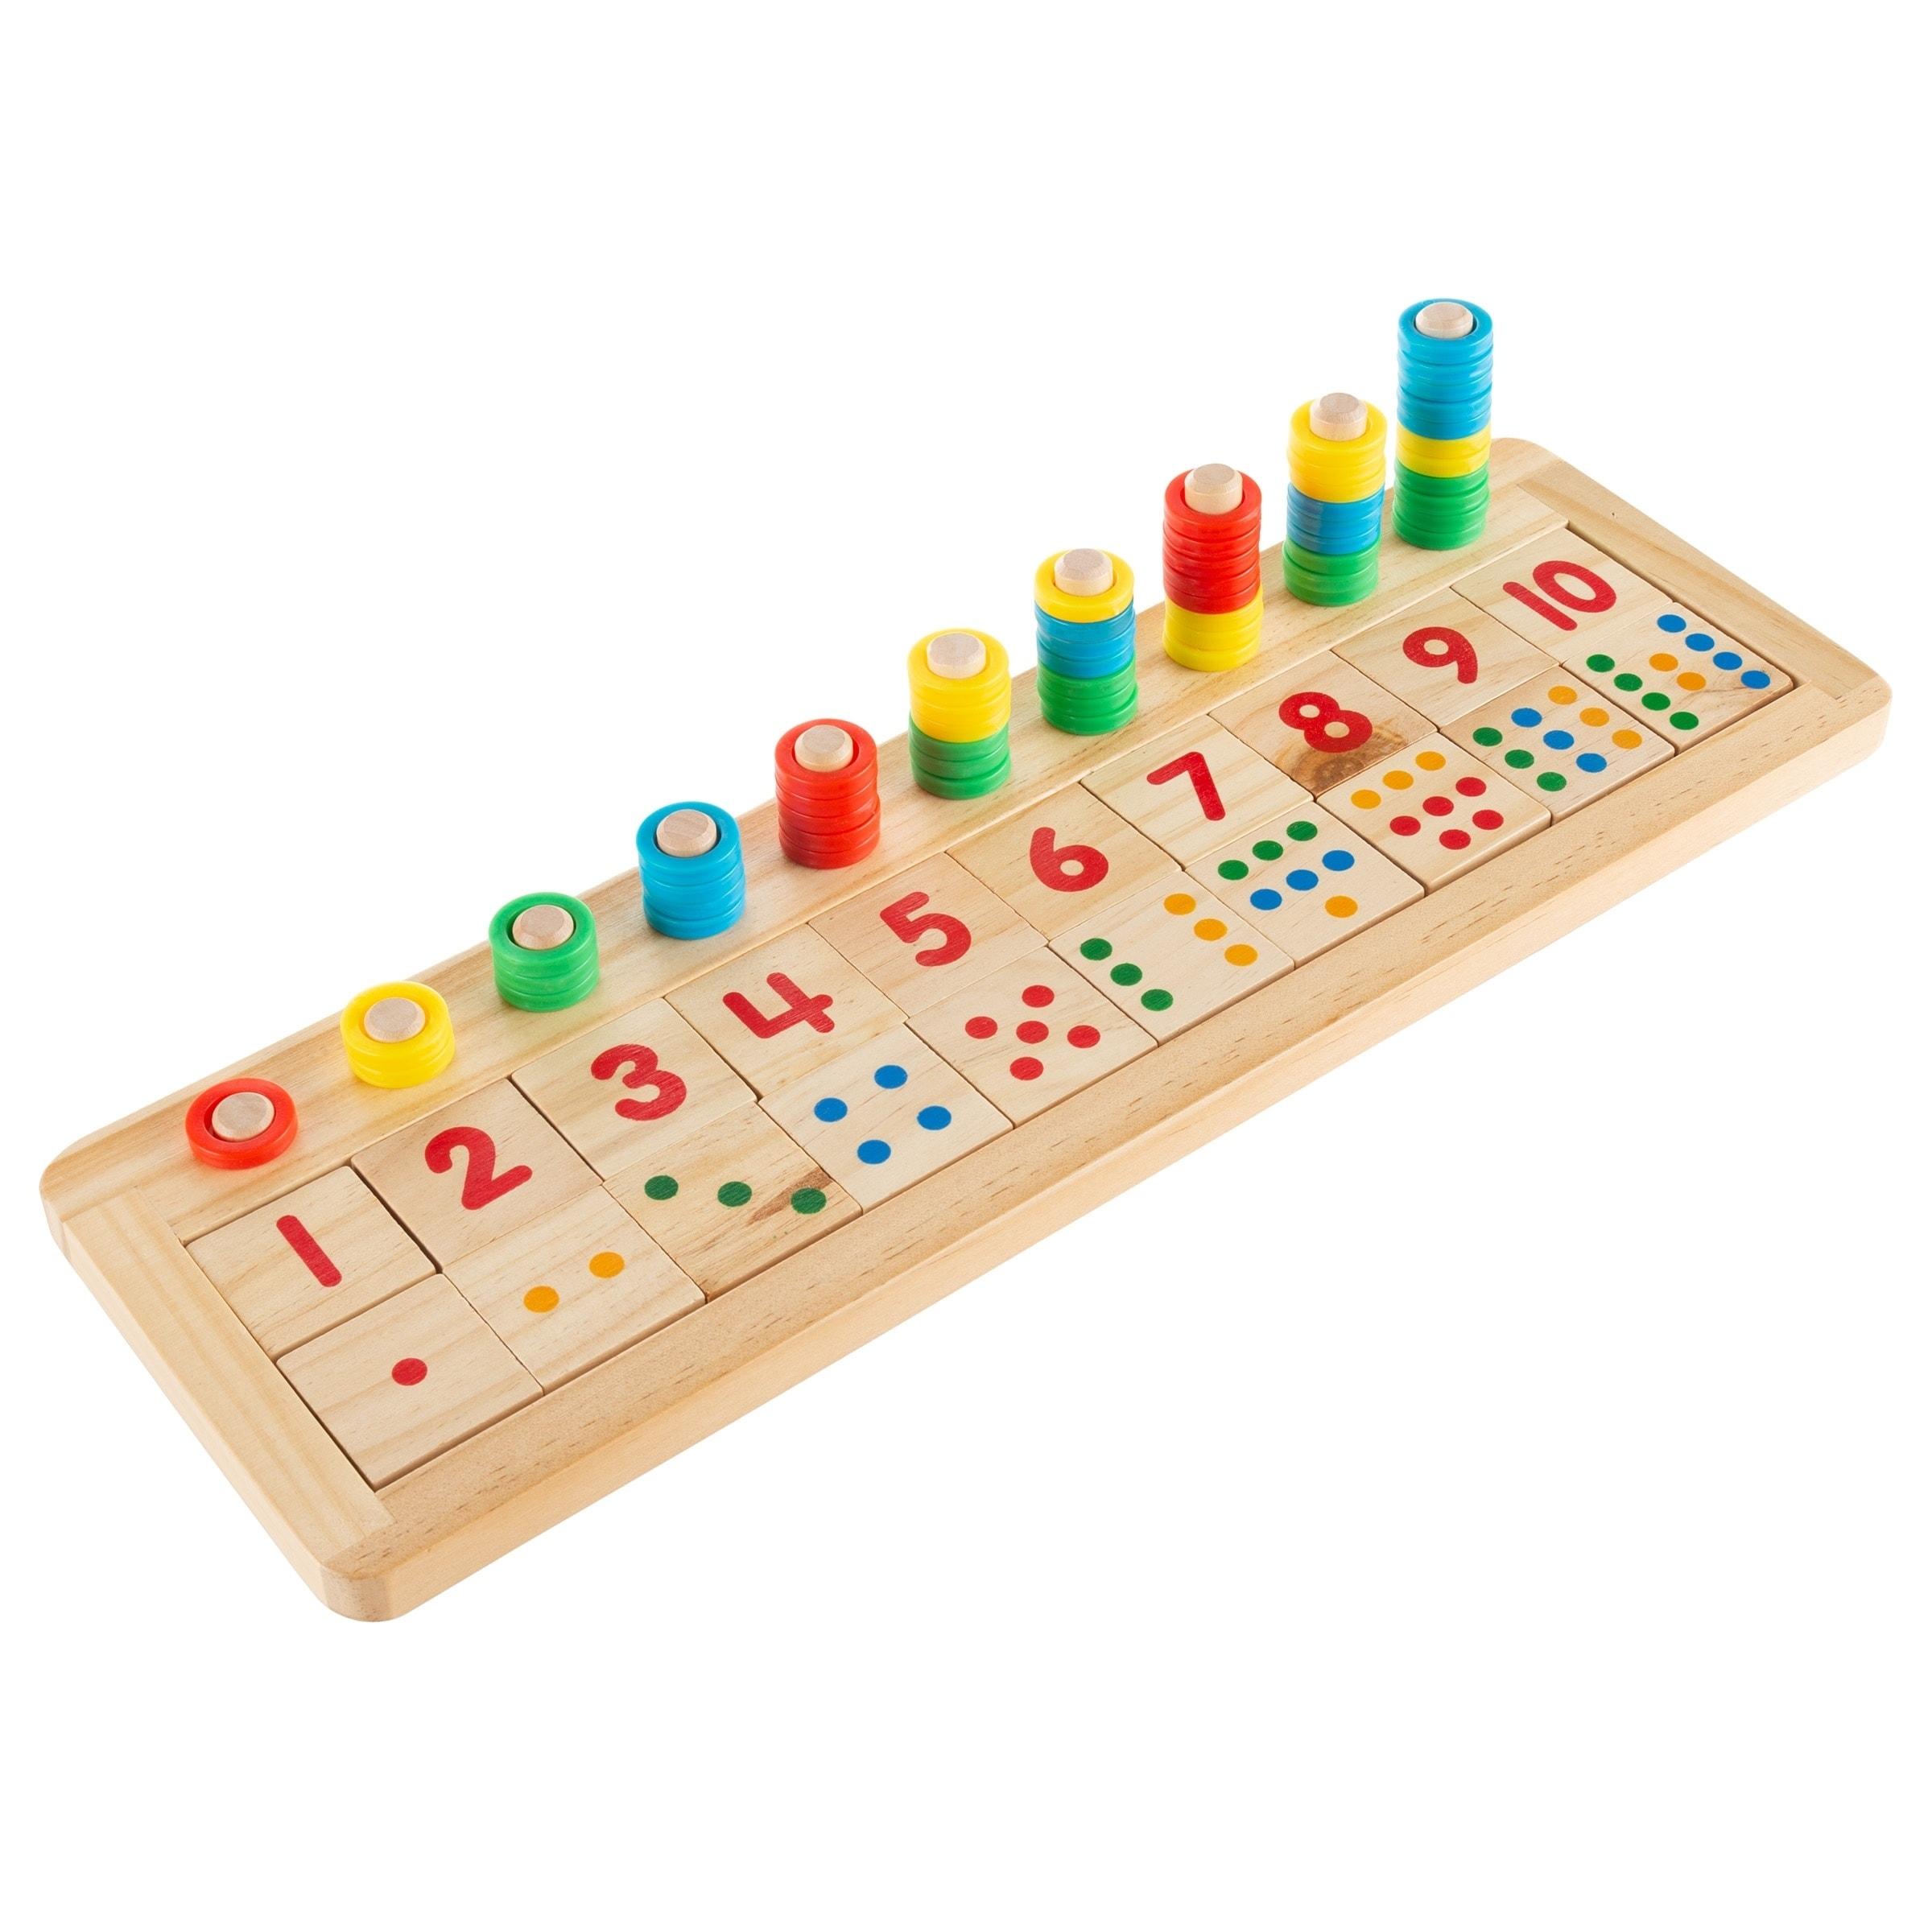 Wooden Montessori Math Board Shape Sorter Preschool Intellectual Toys Children